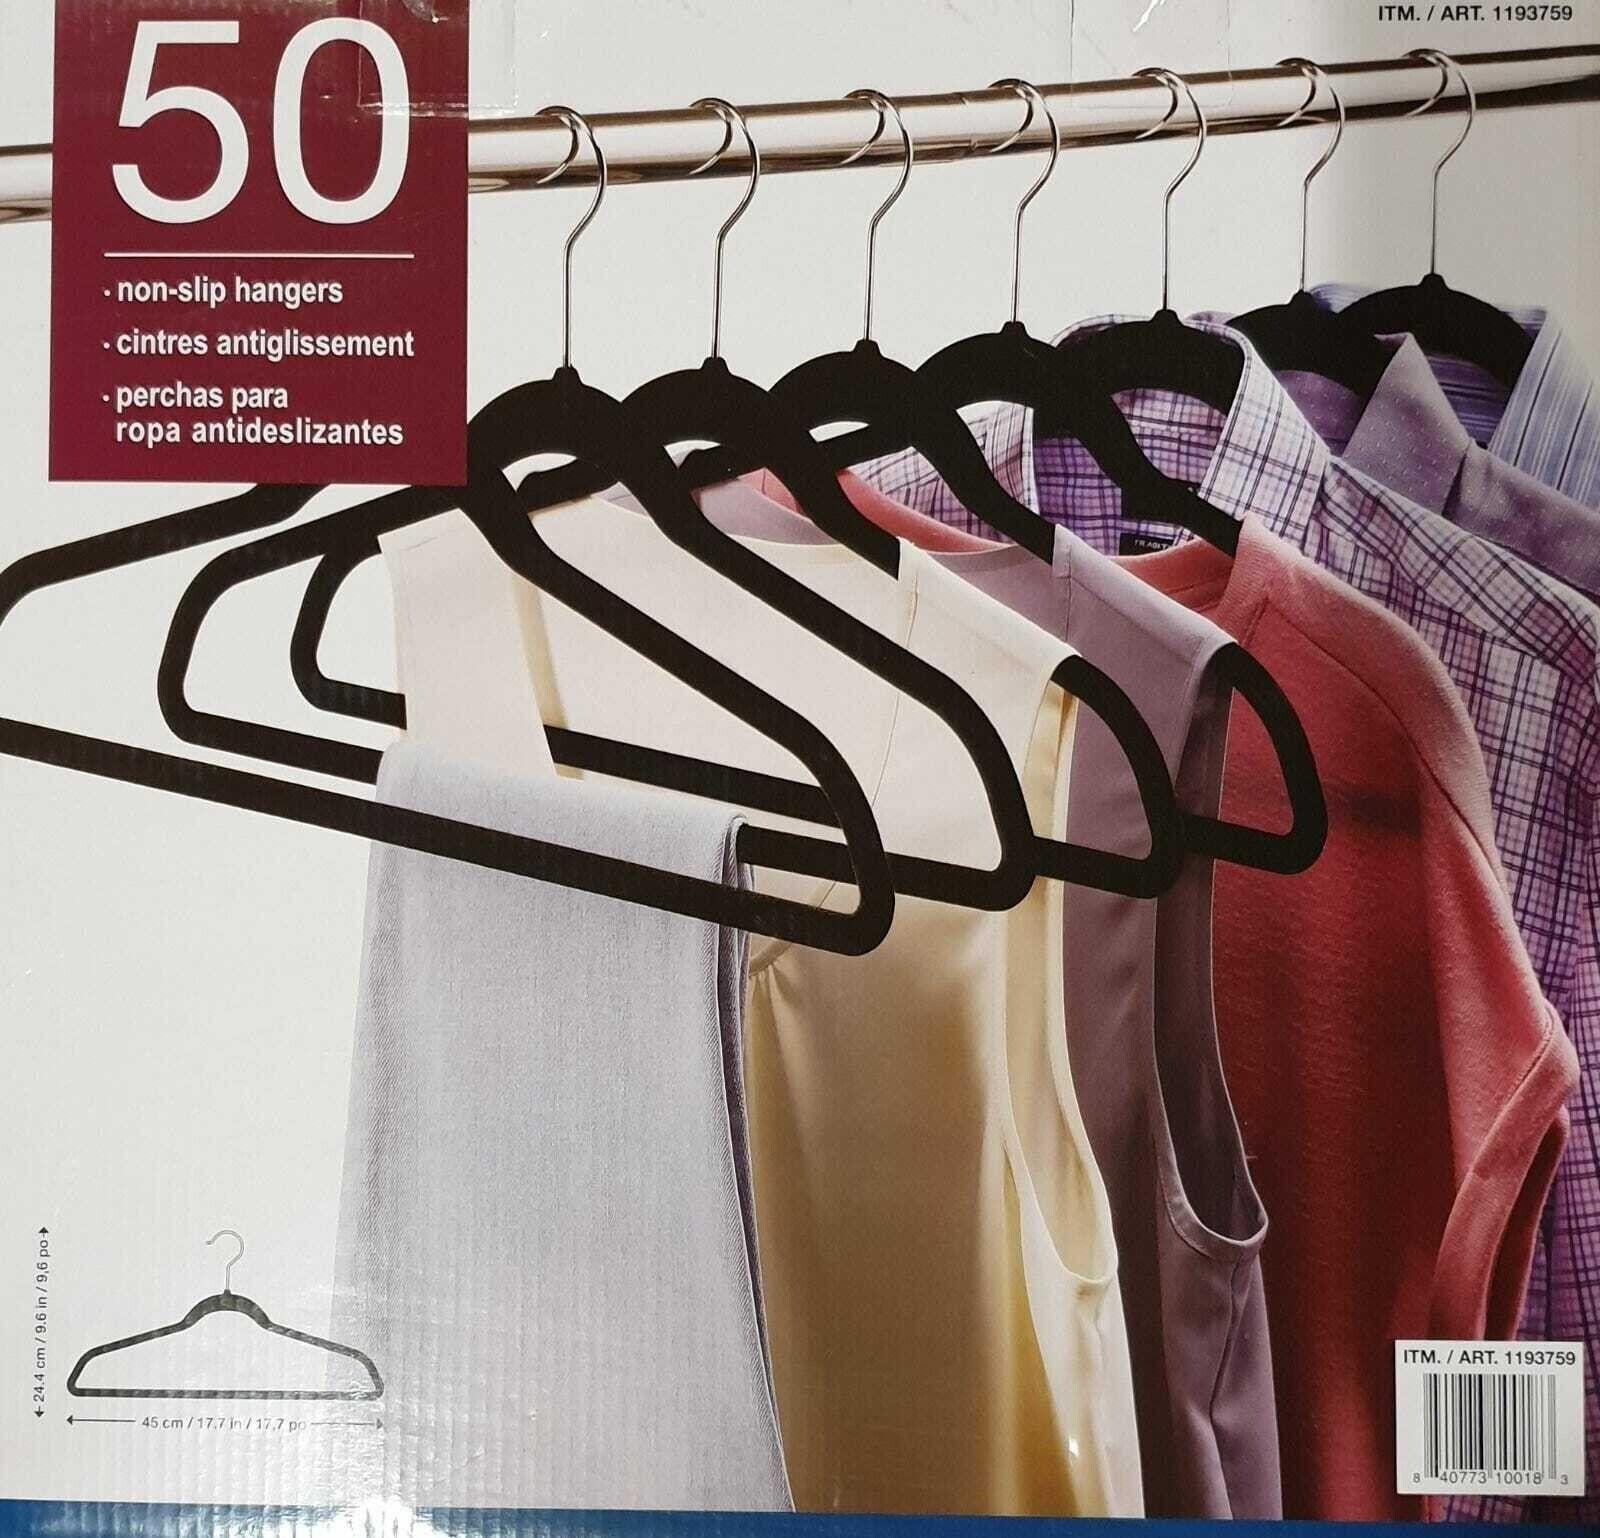 50 Black Velvet Clothes Coat Hangers Ultra Thin Non Slip Space Saving Free Post Ebay